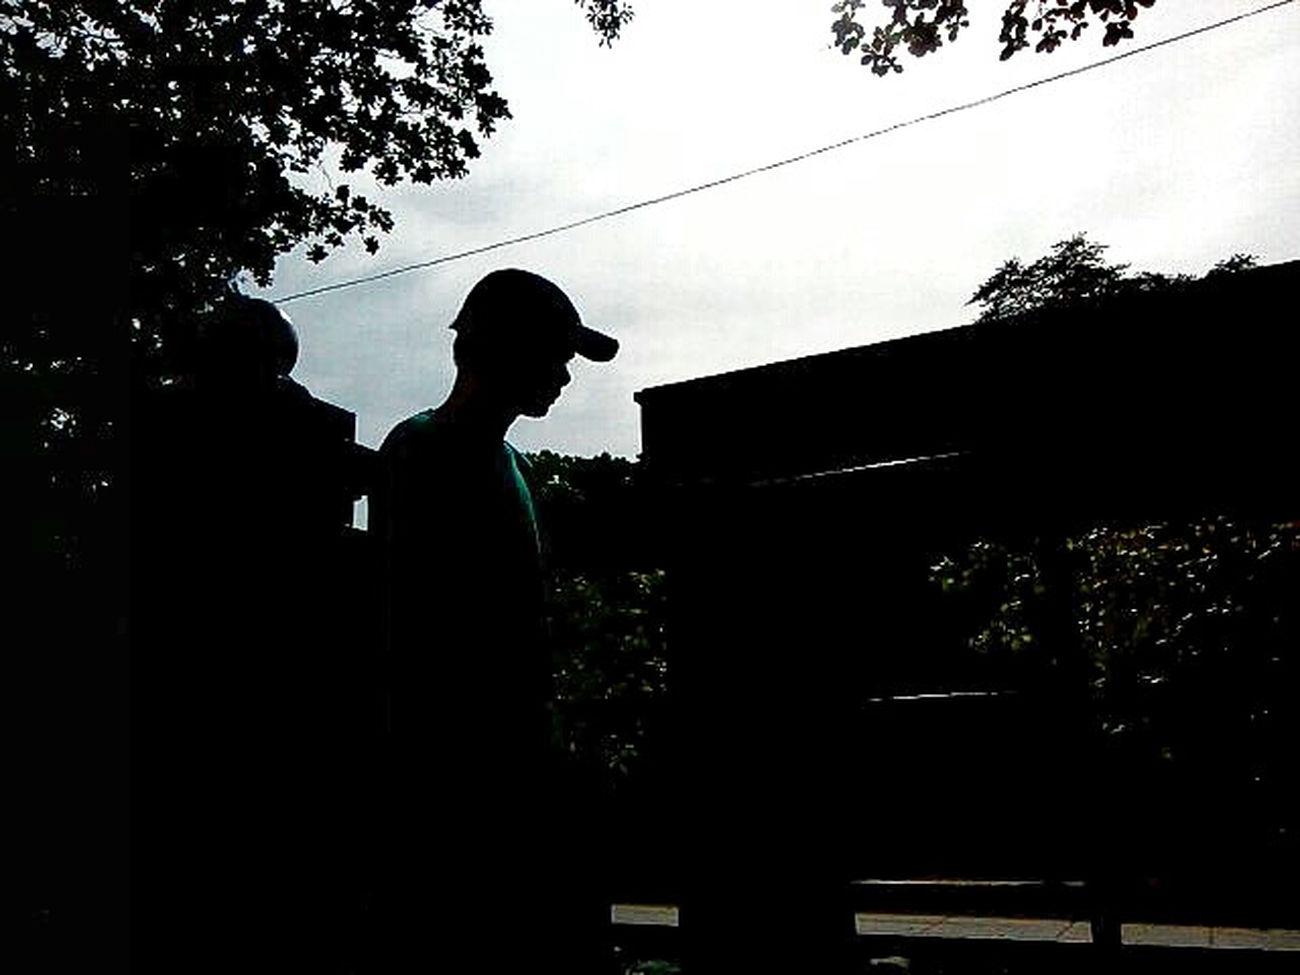 Silhouette One Person Outdoors Streetphotography Eyeem Philippines EyeEm Best Shots LitratistaSaDaan EyeEm CaptureTheMoment